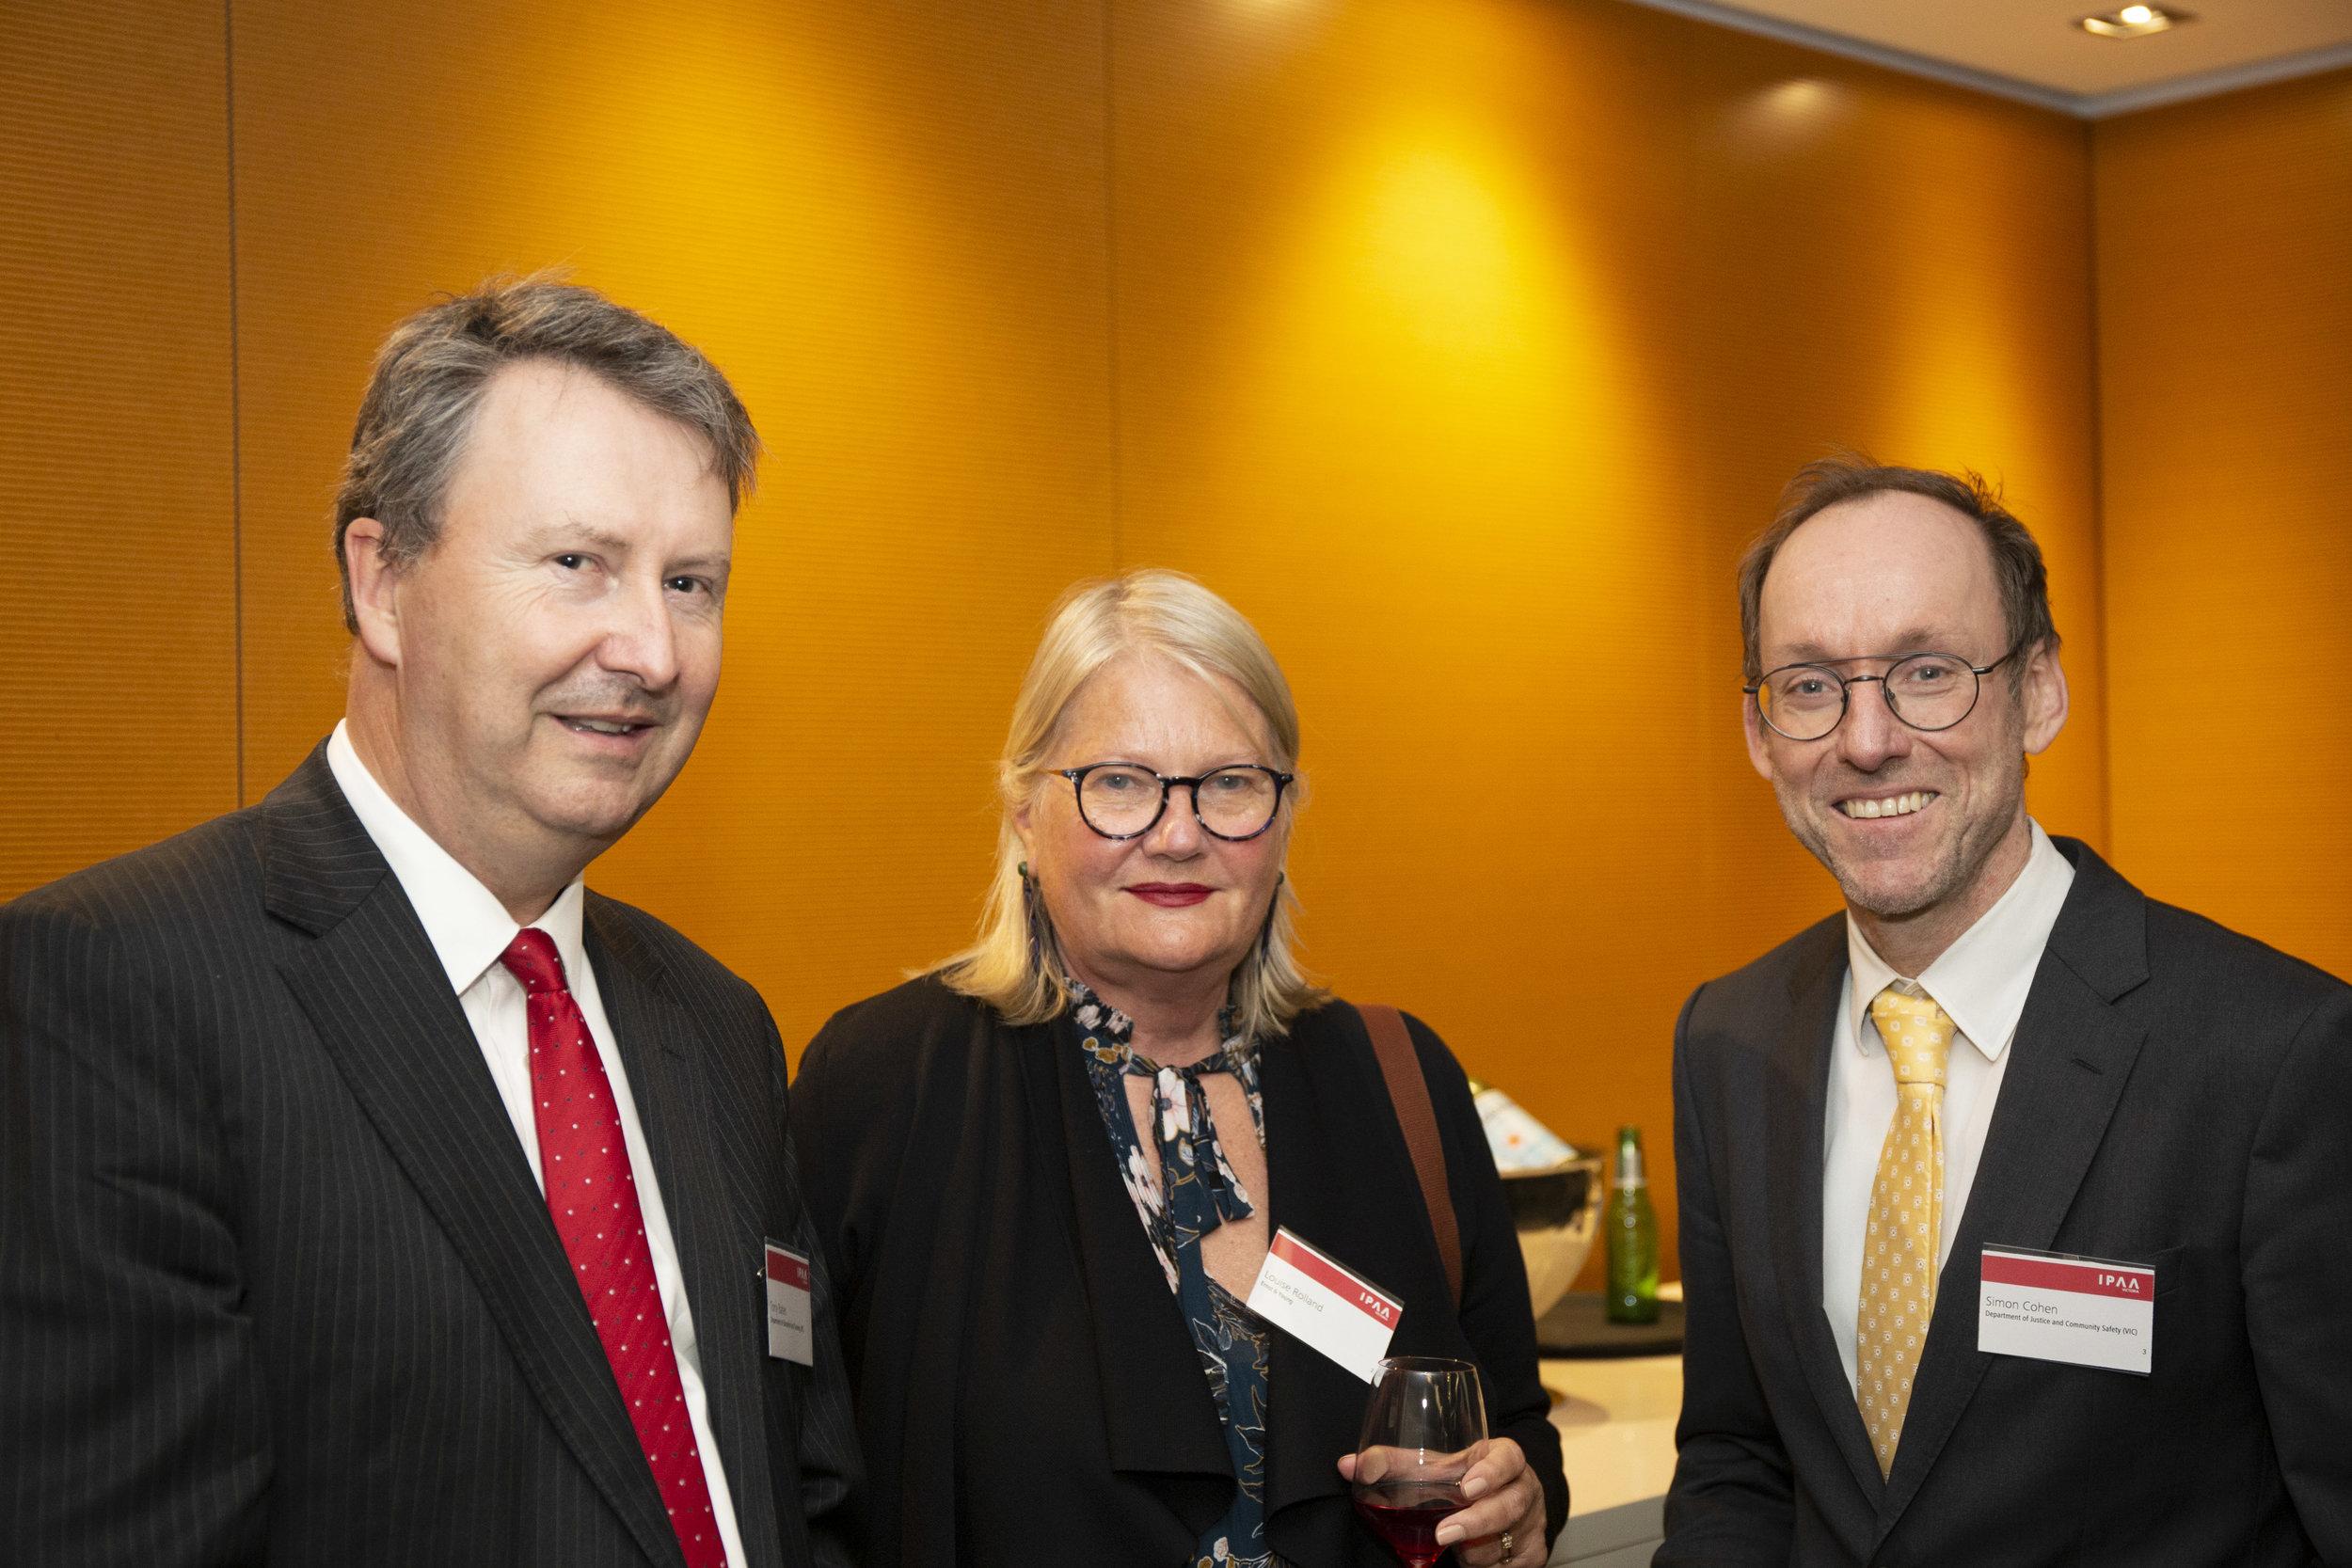 Left to right: IELP alumnus Tony Bates PSM (DET); Louise Rolland (EY); and IELP alumnus Simon Cohen (DJCS)